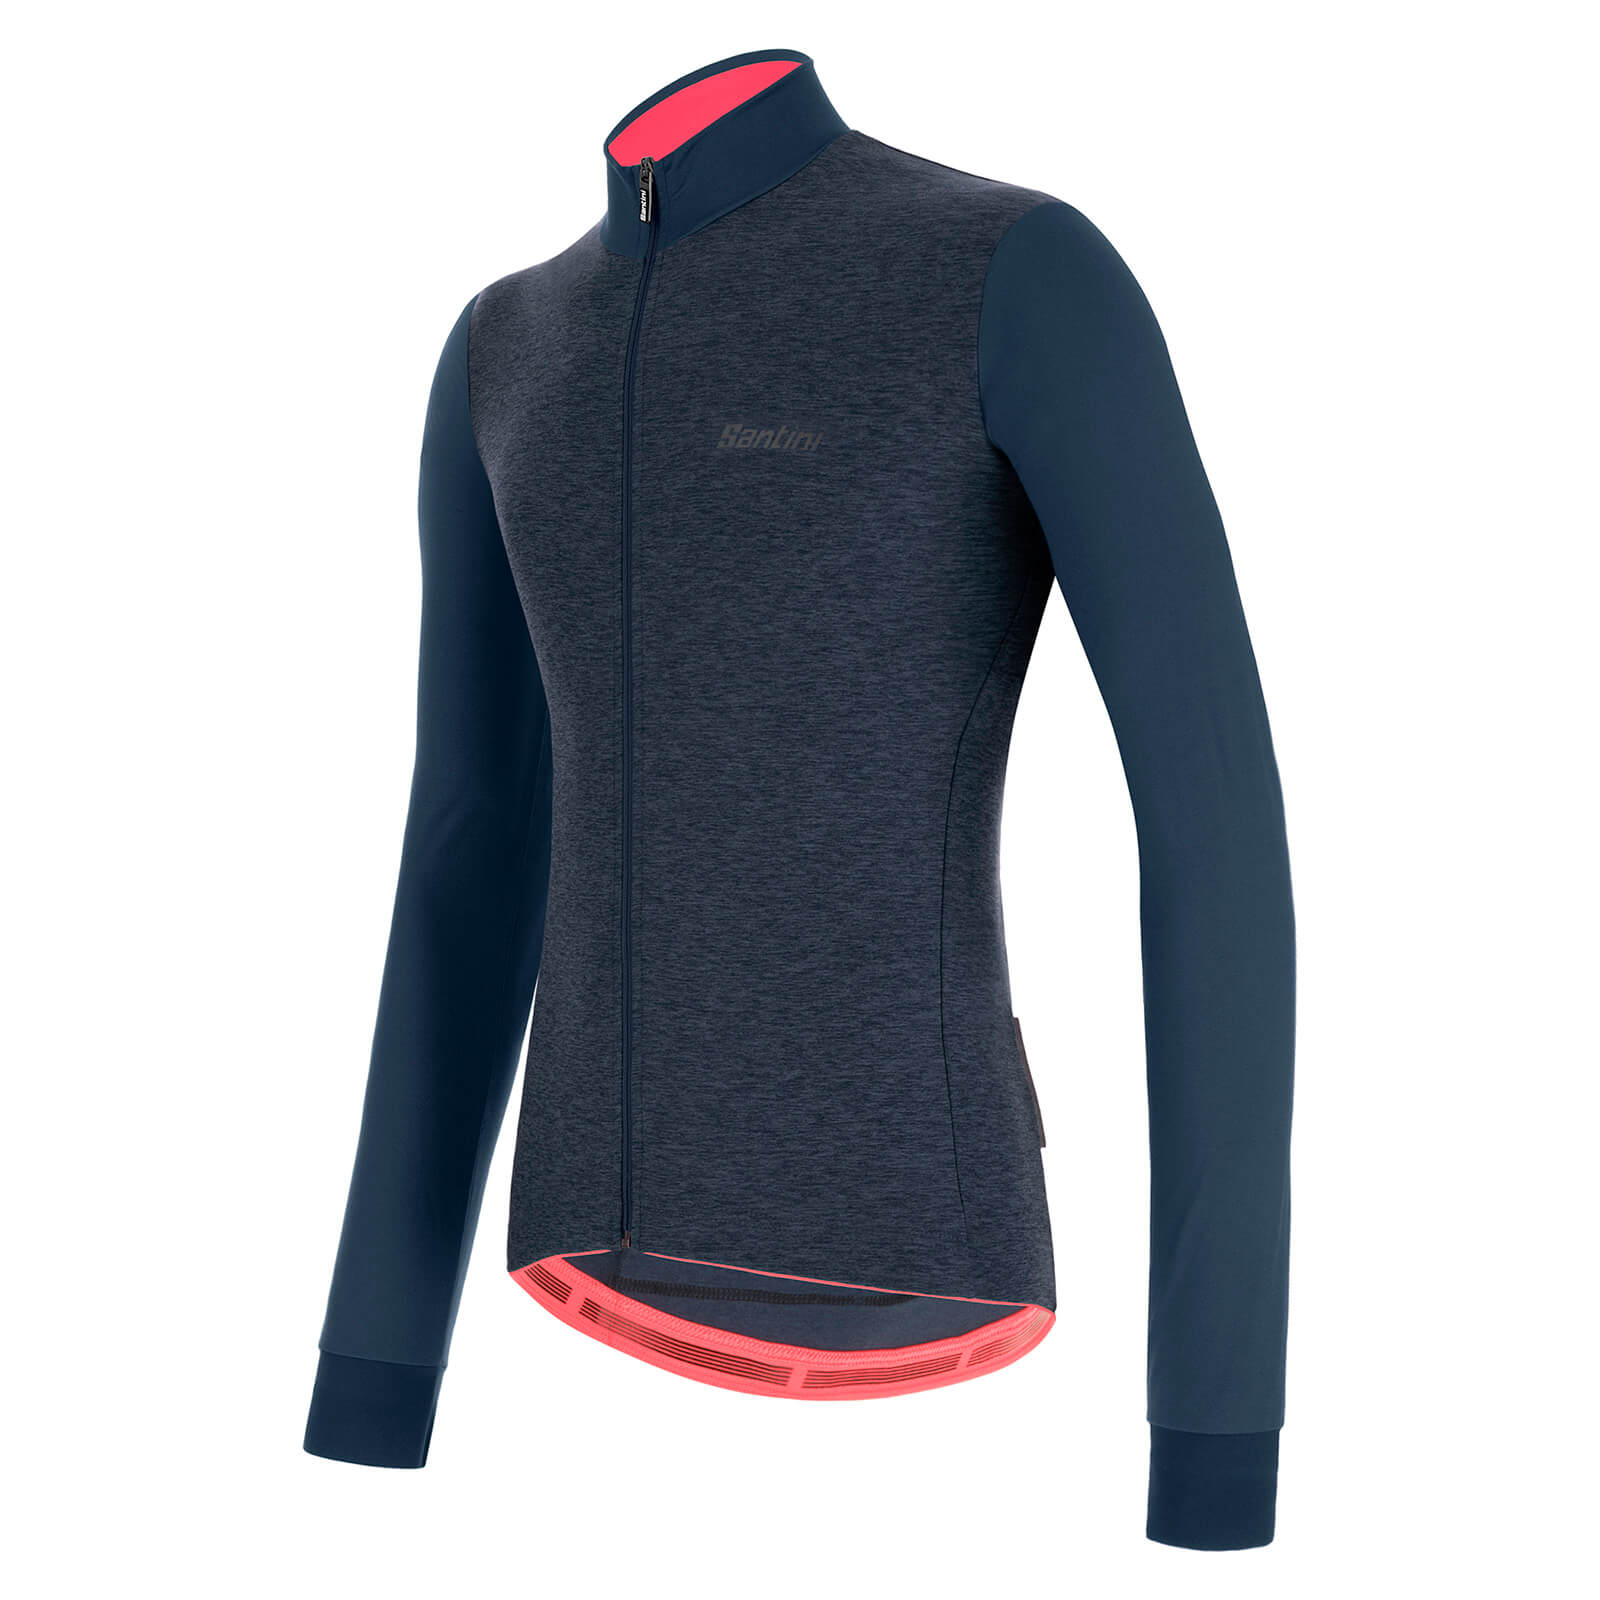 Santini Colore Puro Long Sleve Jersey - XL - Nautica Blue